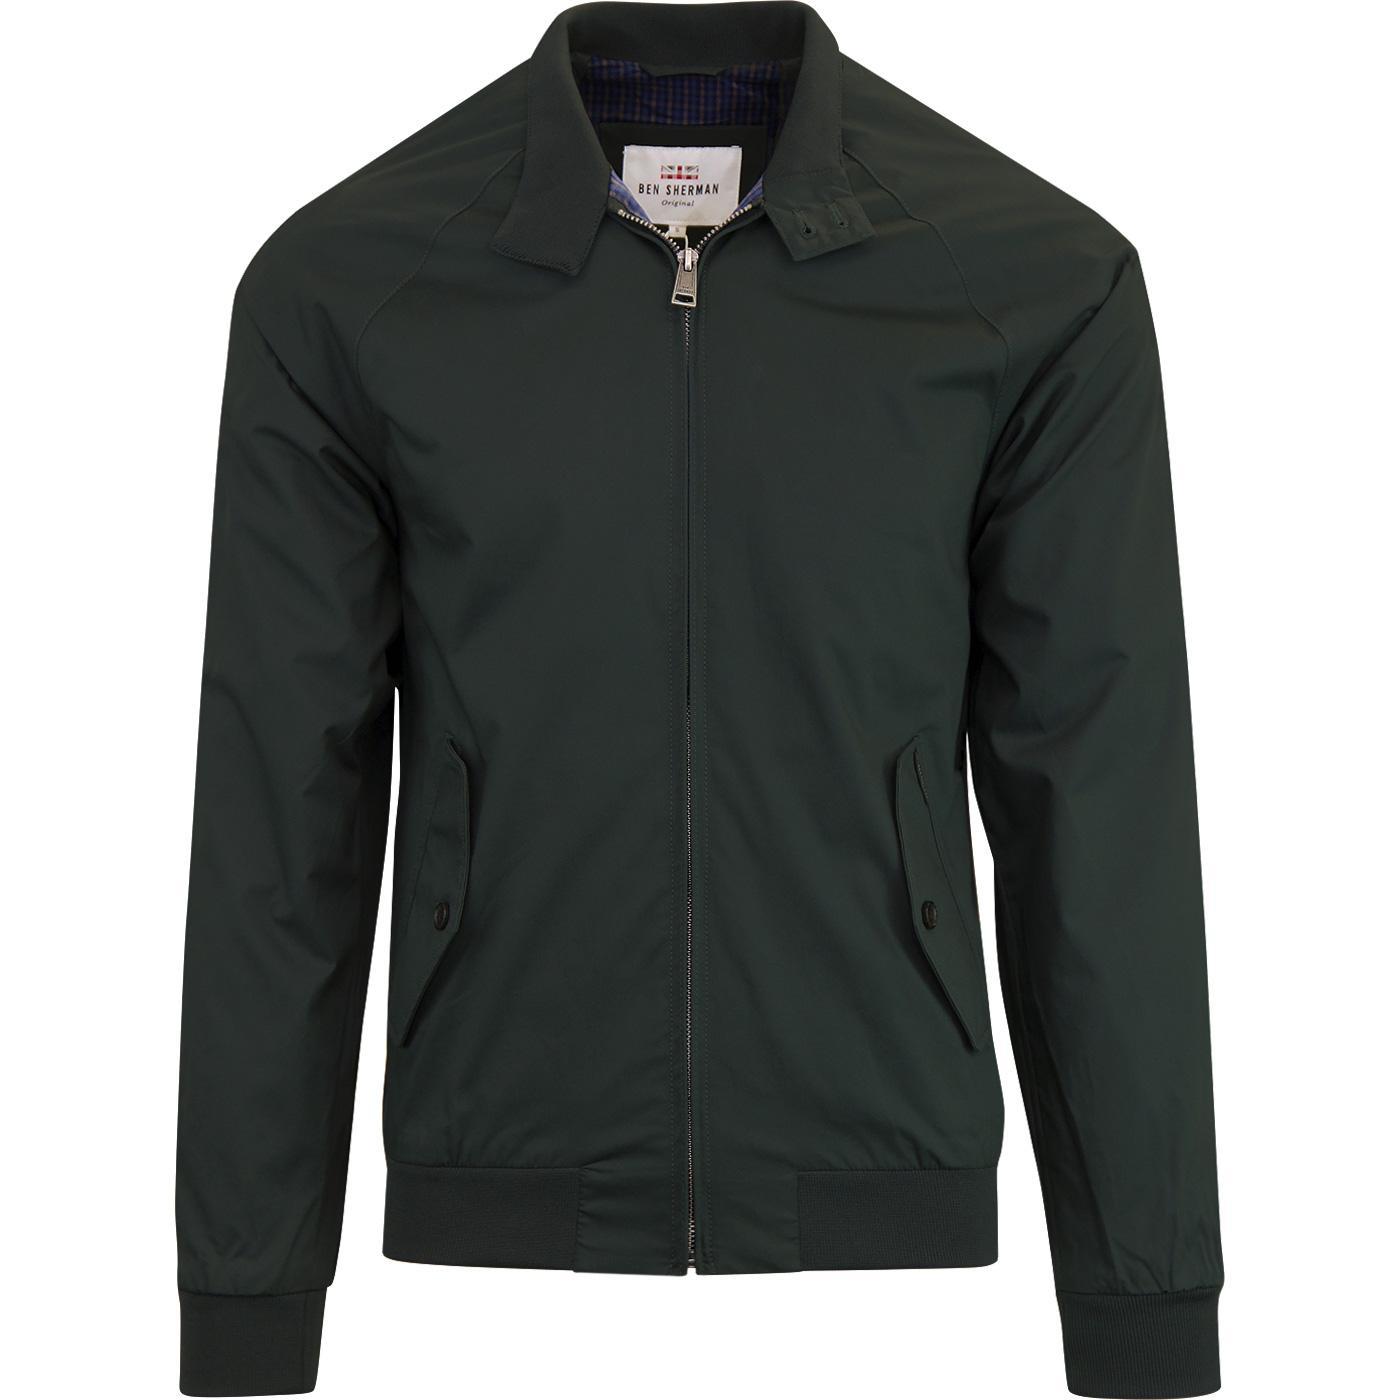 BEN SHERMAN Retro Mod Harrington Jacket (Forest)